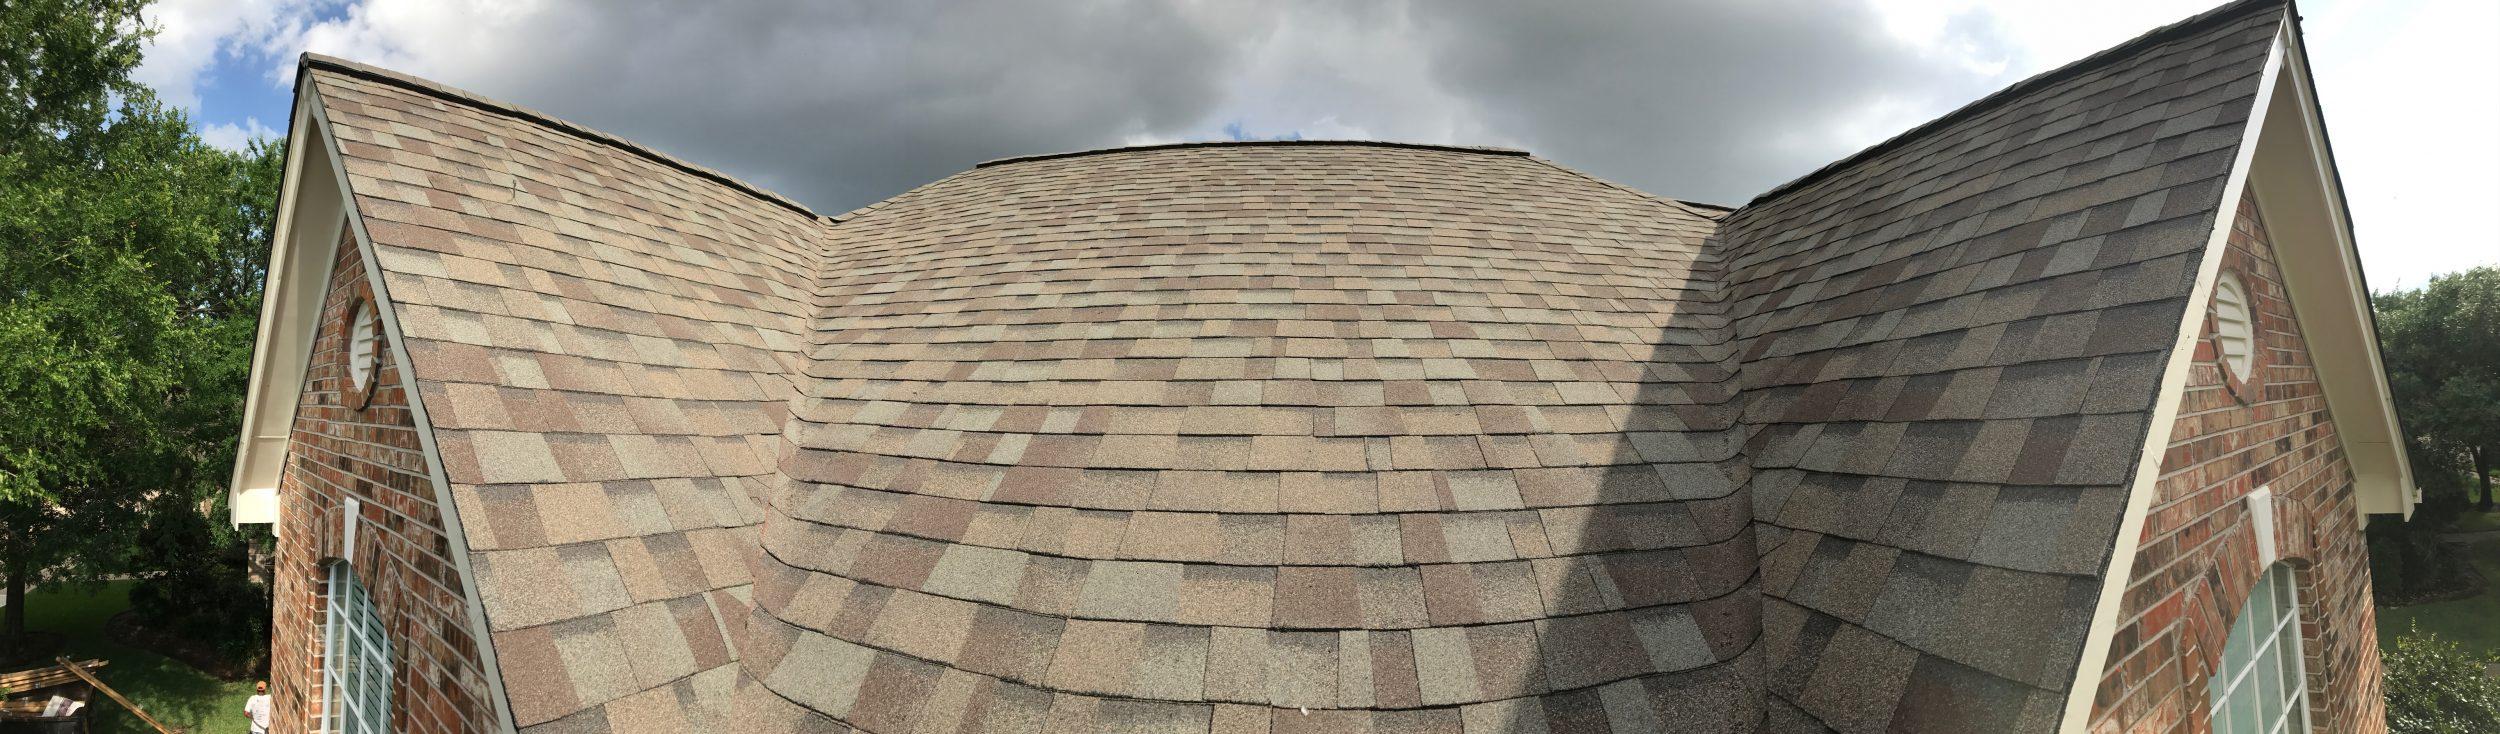 Holden Roofing Roof Fisheye